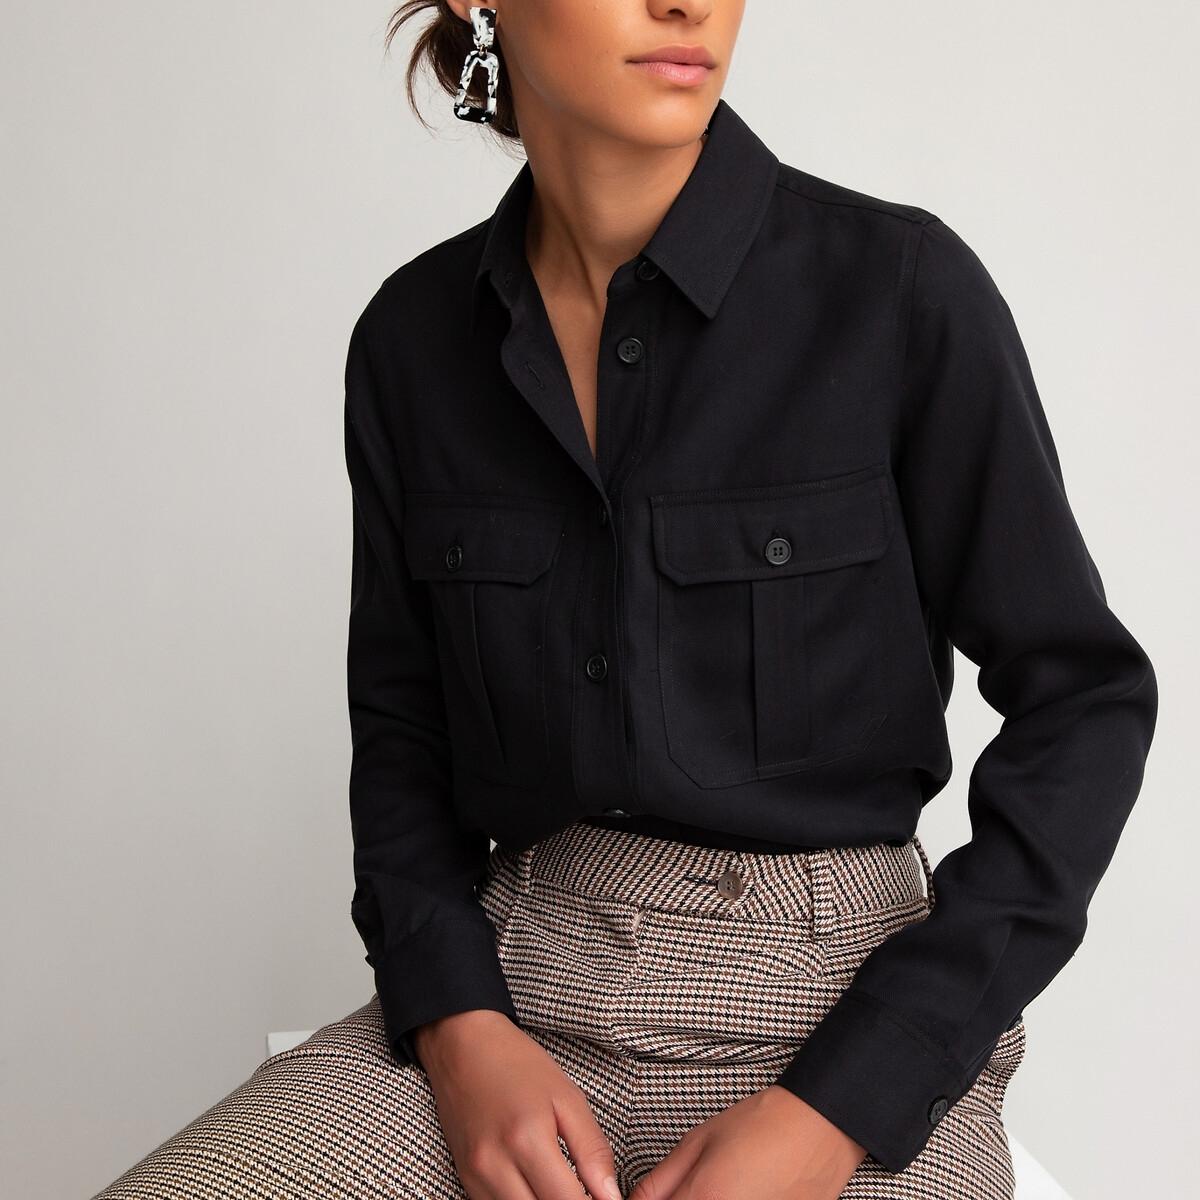 Camisa vaporosa de estilo militar de manga larga